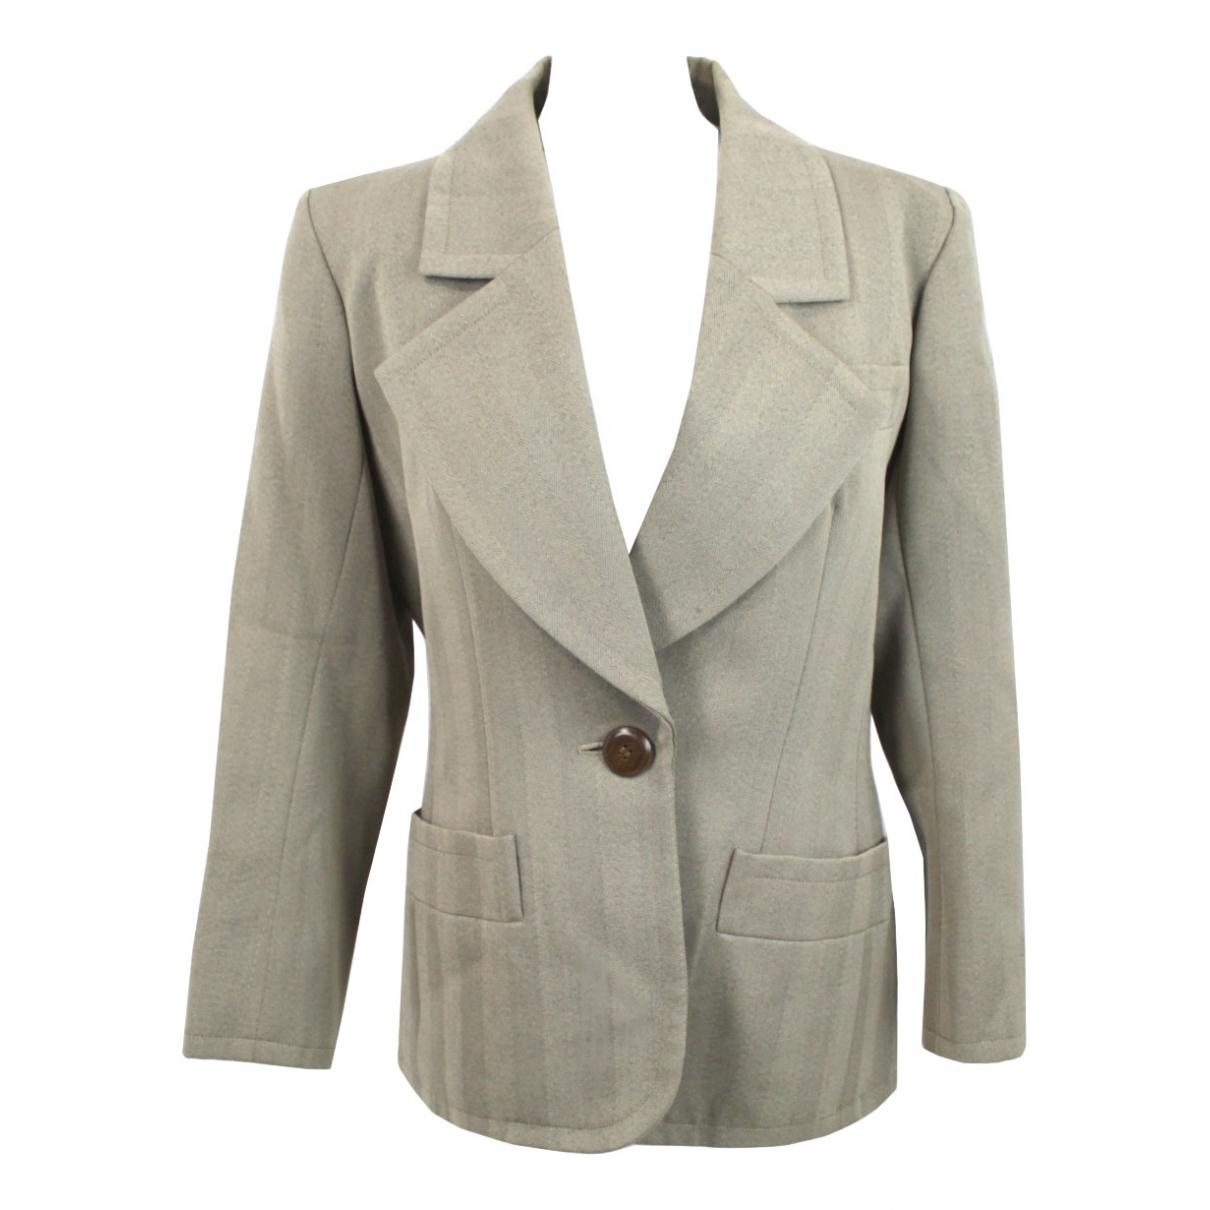 Yves Saint Laurent N Beige Wool jacket for Women 40 FR